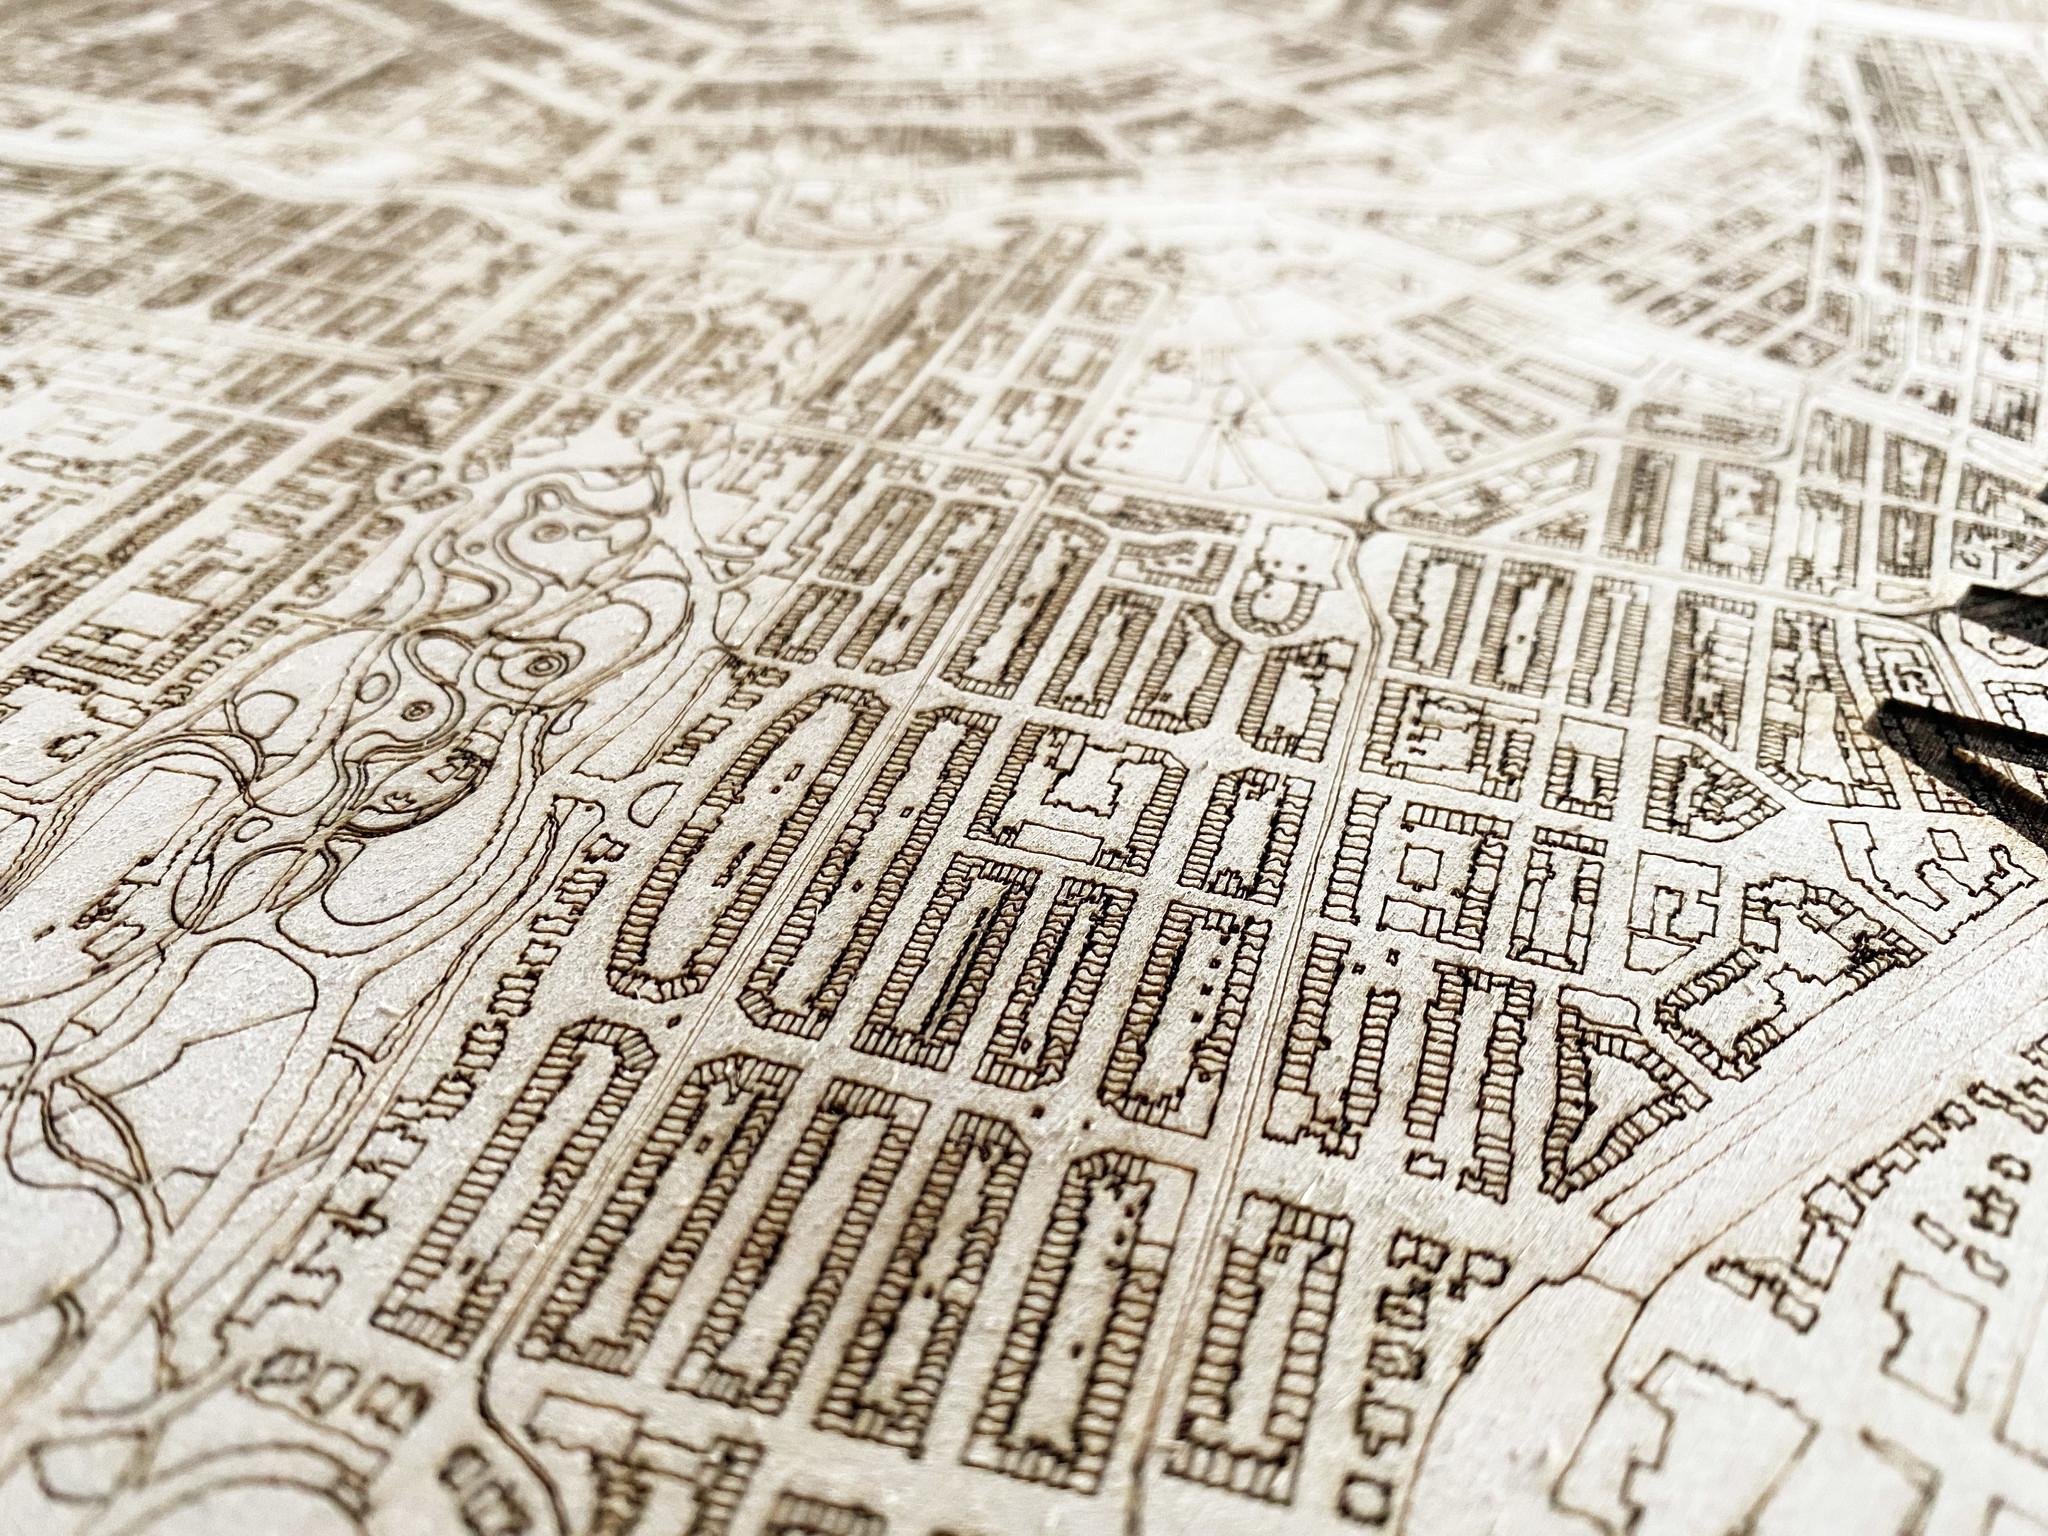 Houten stadsplattegrond Krakau-3